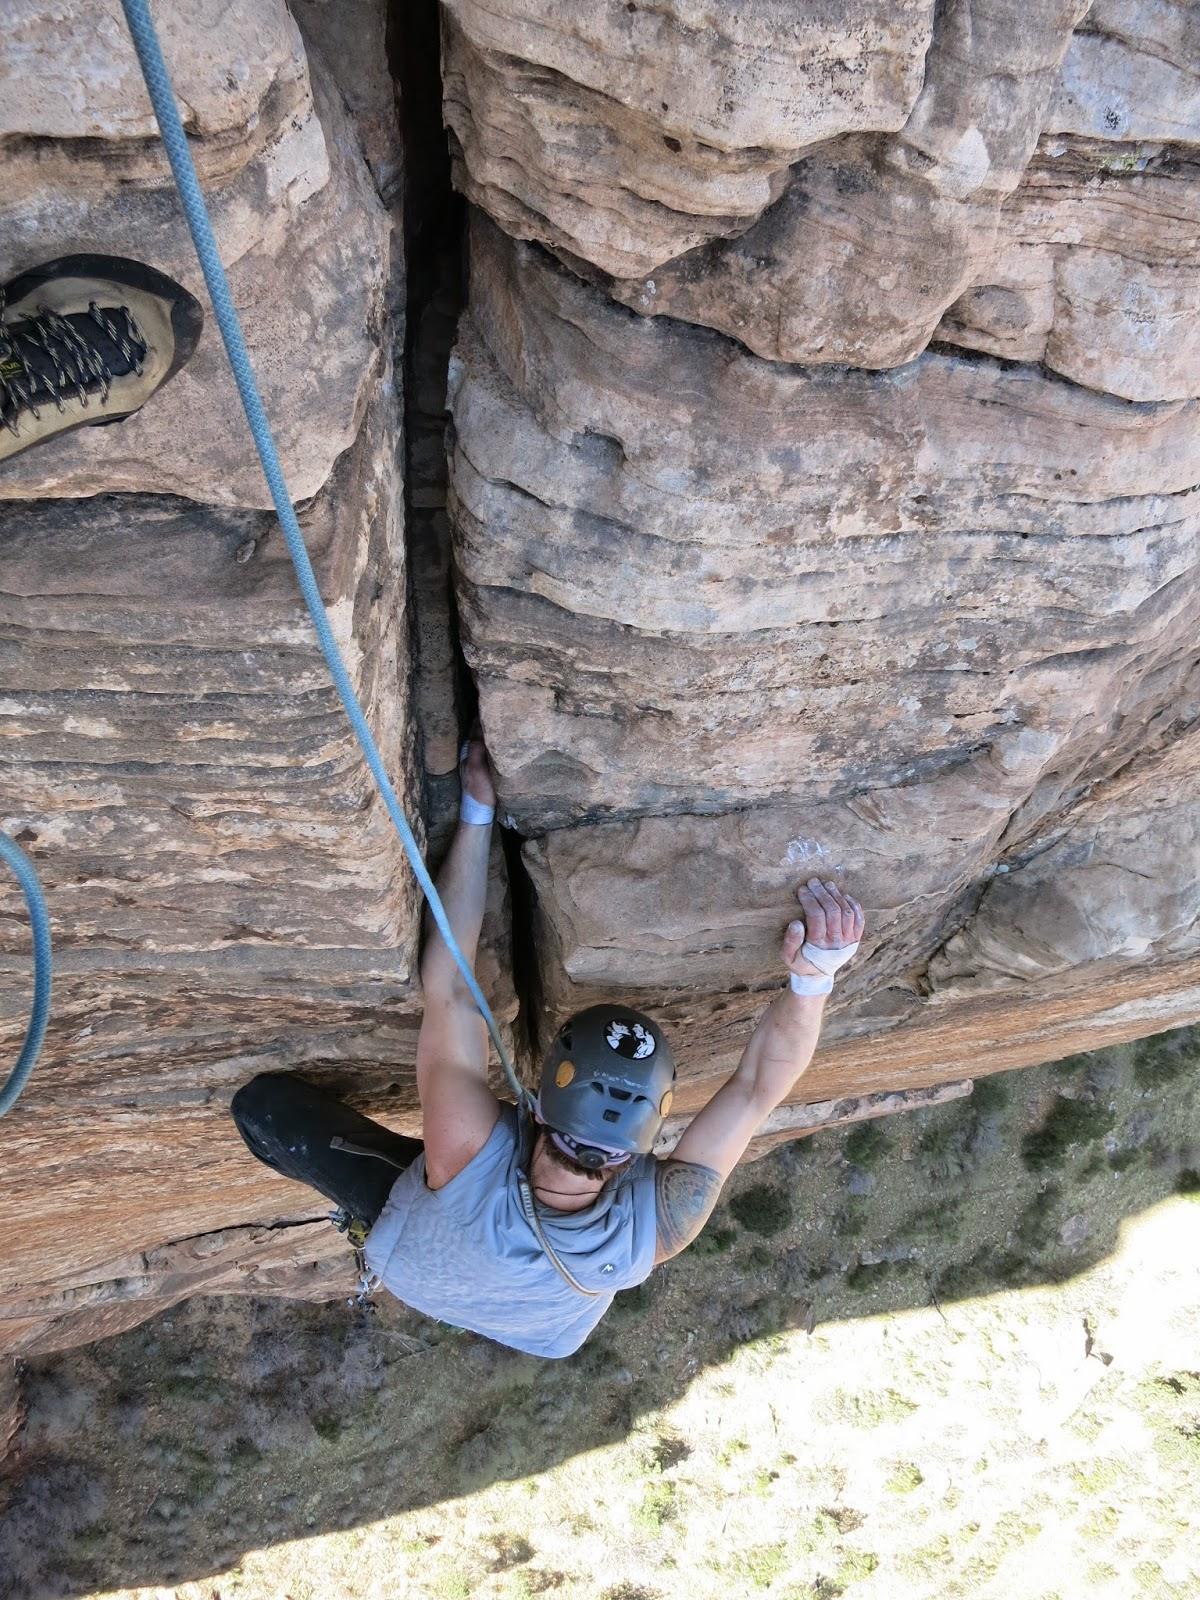 Rock Climbing 101: Beginner Tips Rock Climbing 101: Beginner Tips new foto